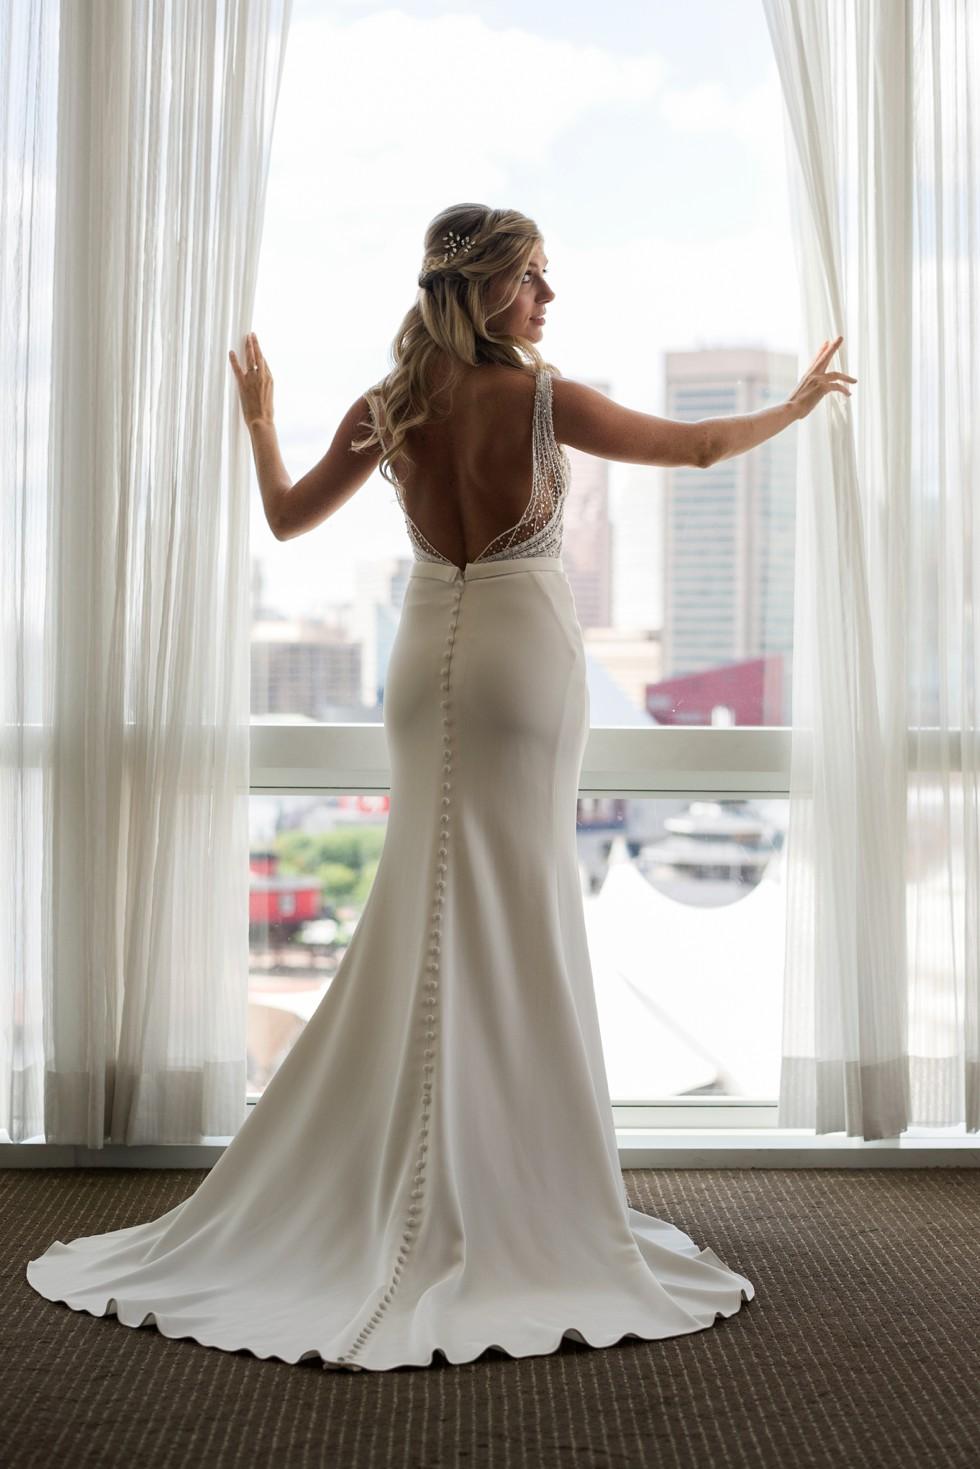 Four Seasons Hotel baltimore bride wearing a martina liana wedding dress